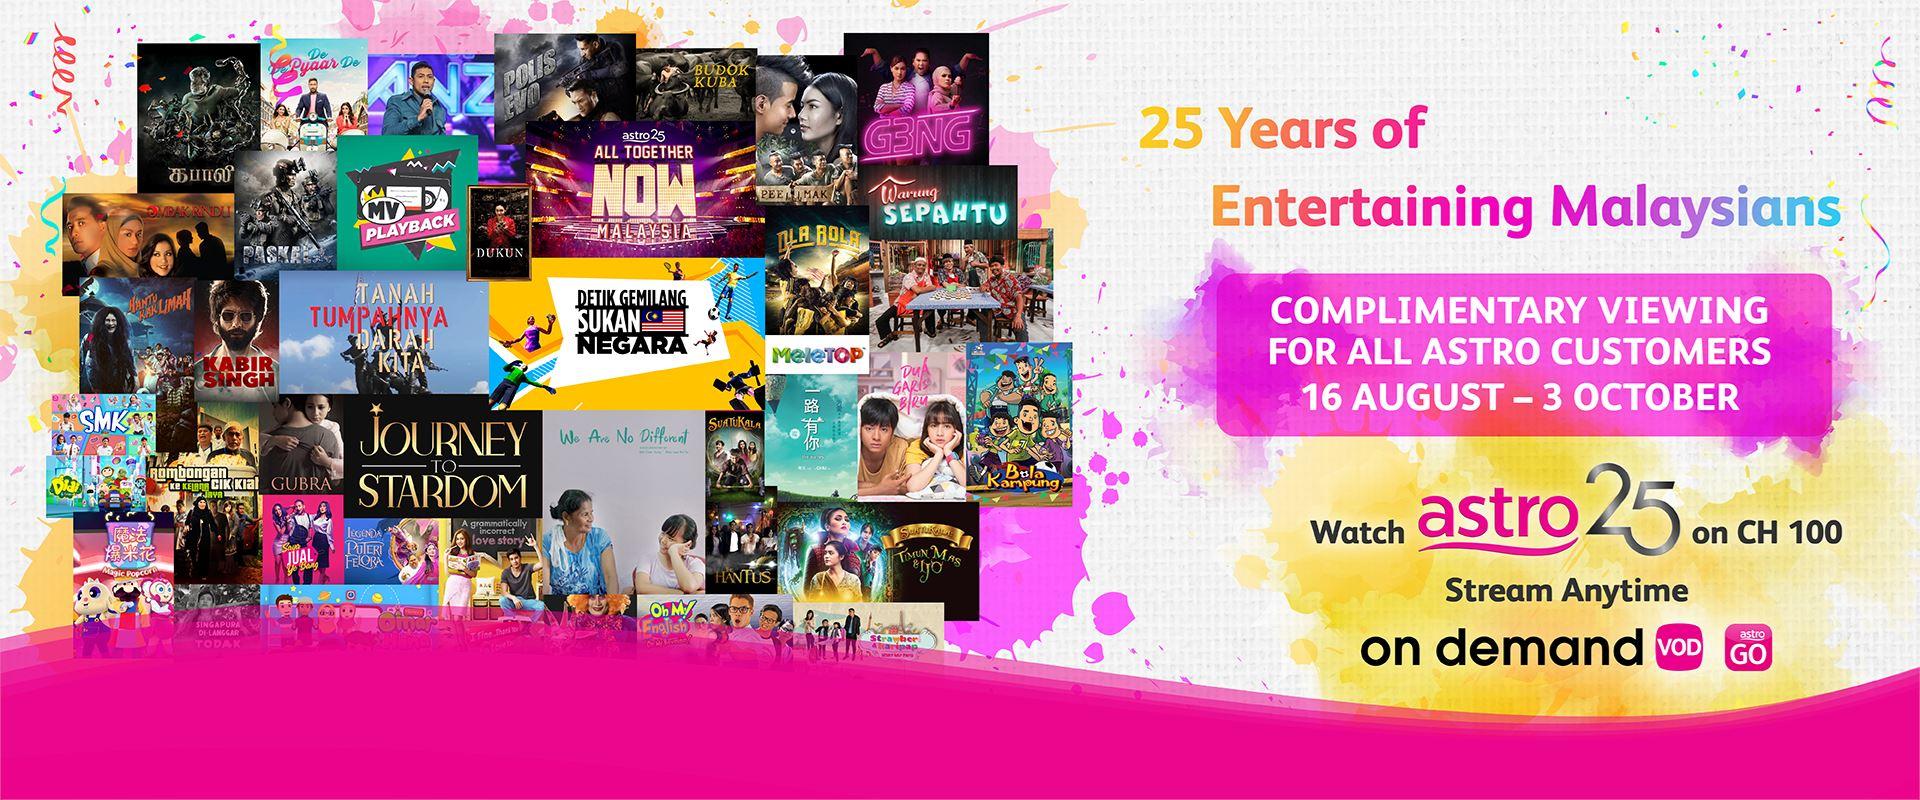 astro为大马人带来25年娱乐,以#kitateguhbersama欢庆今年国庆日!